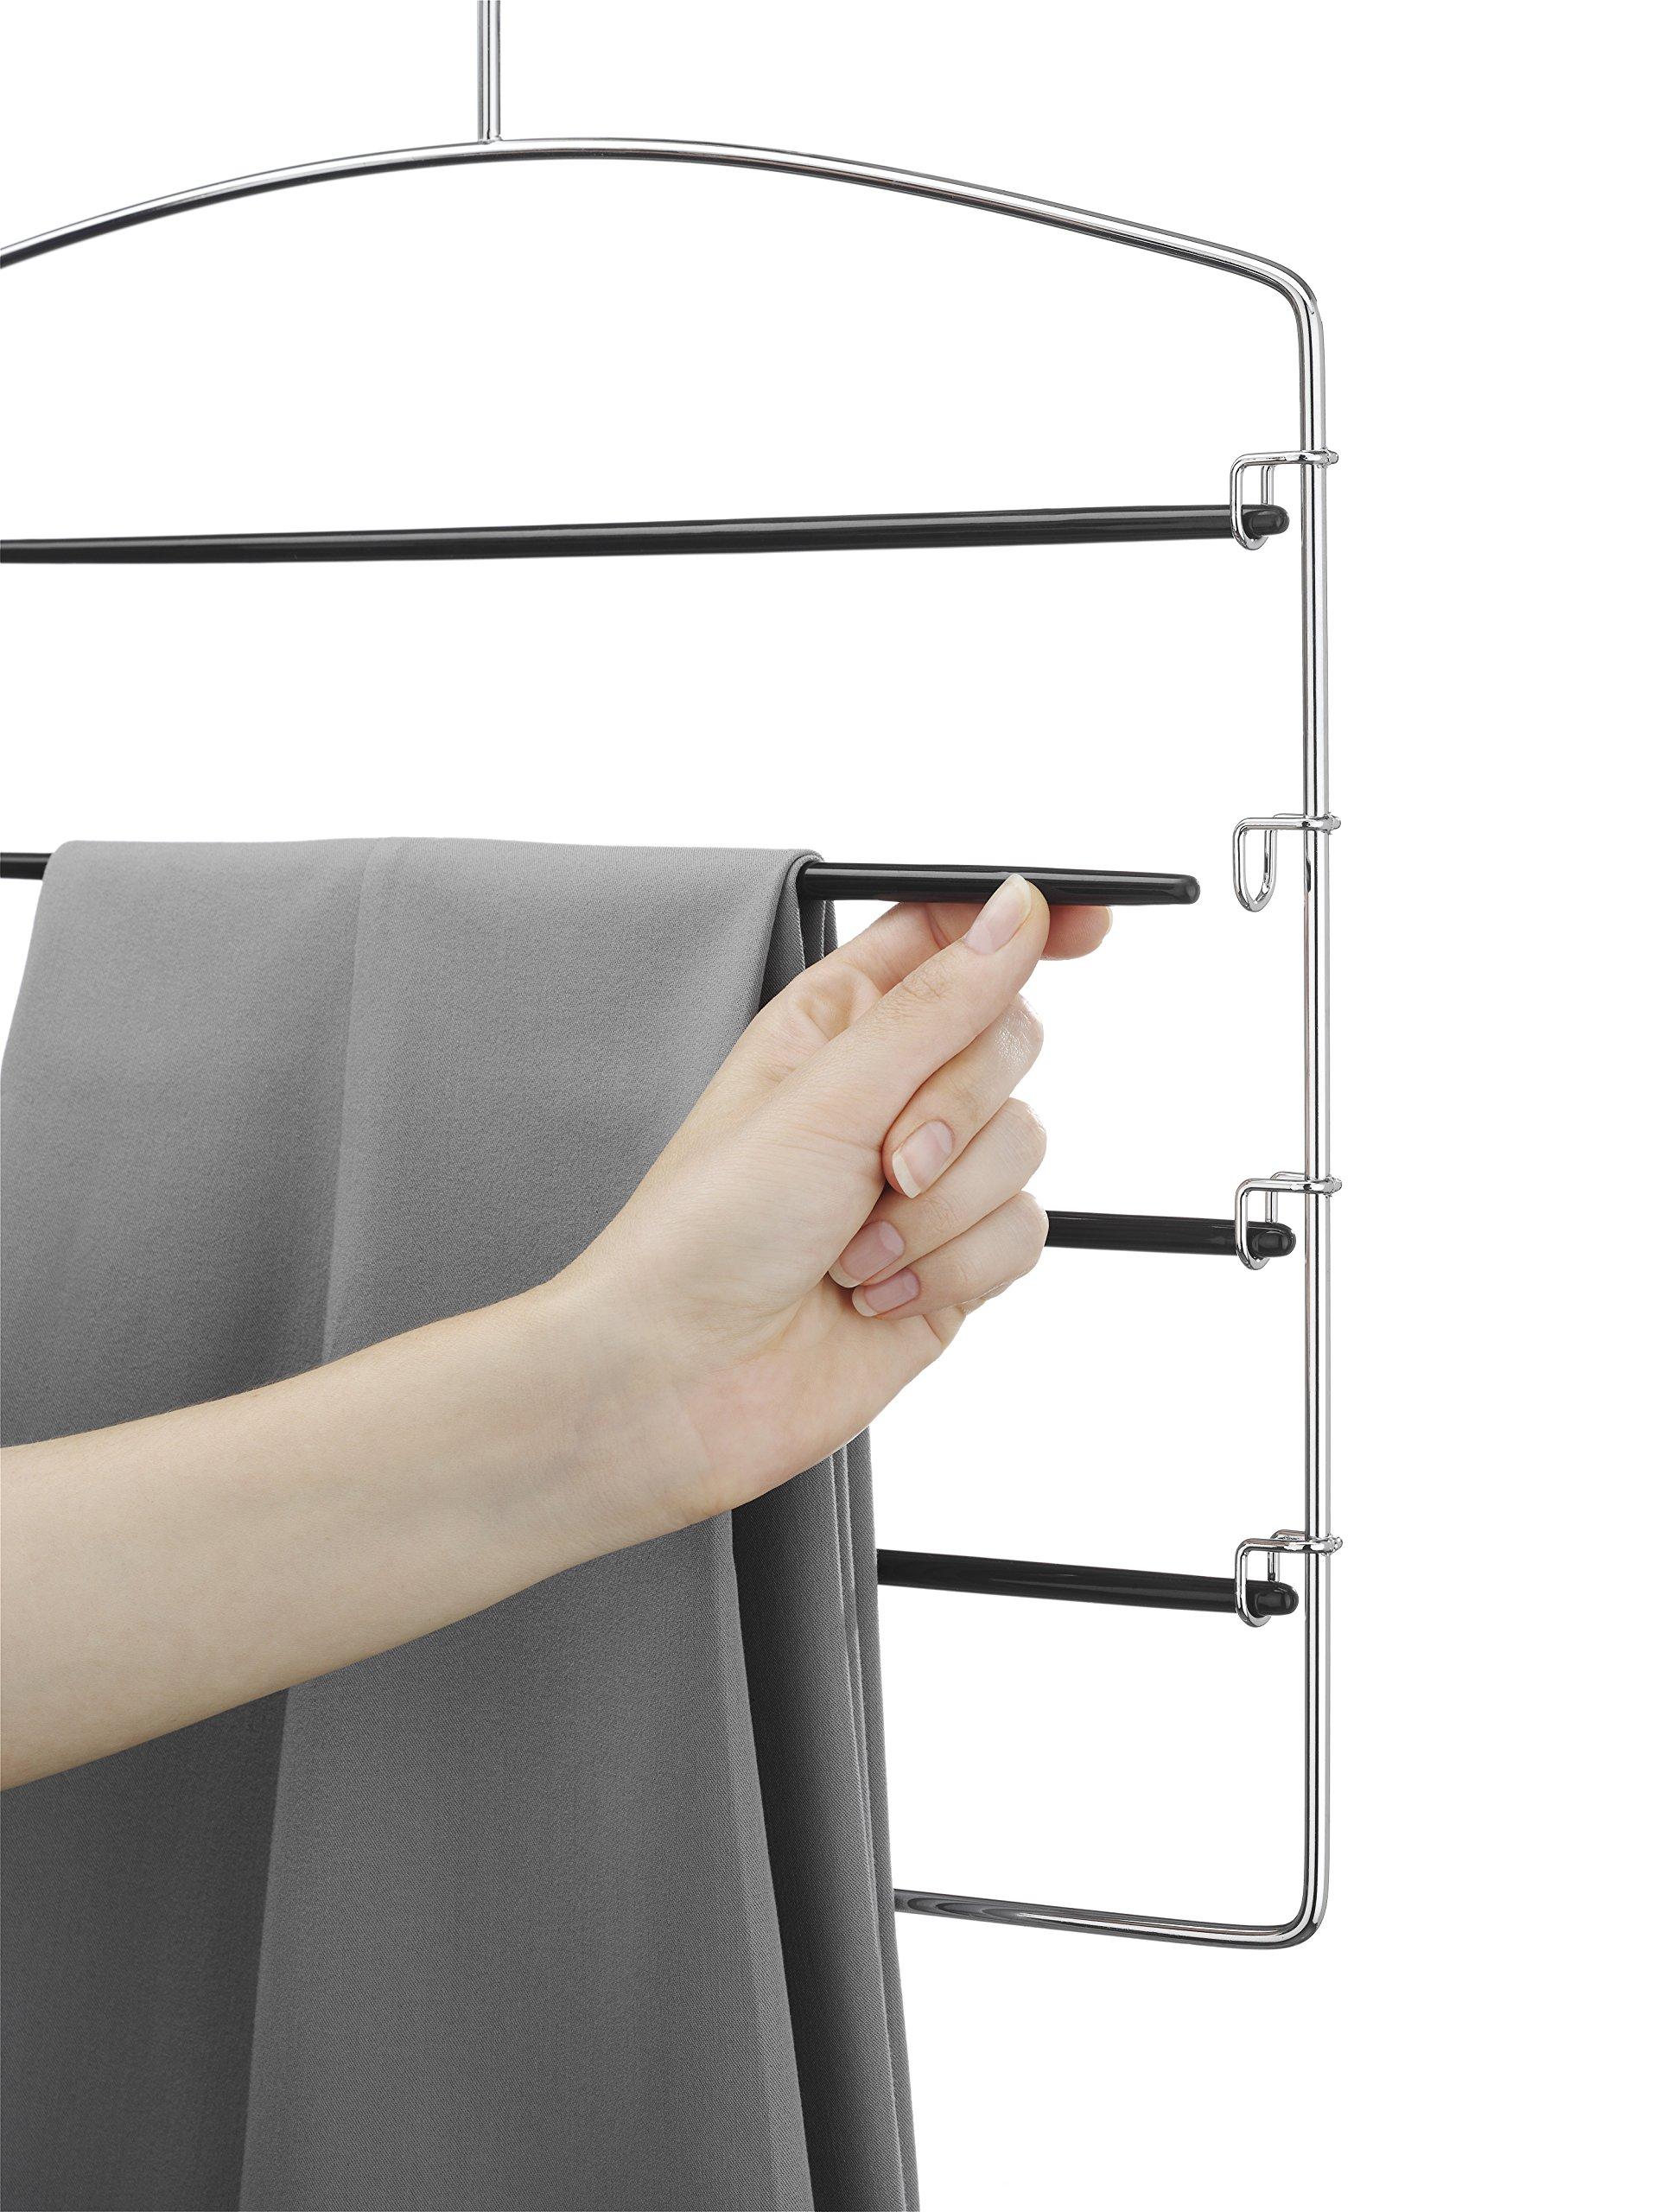 Clothes Hanger Rack Pant Rail Storage Rod Organizer Door